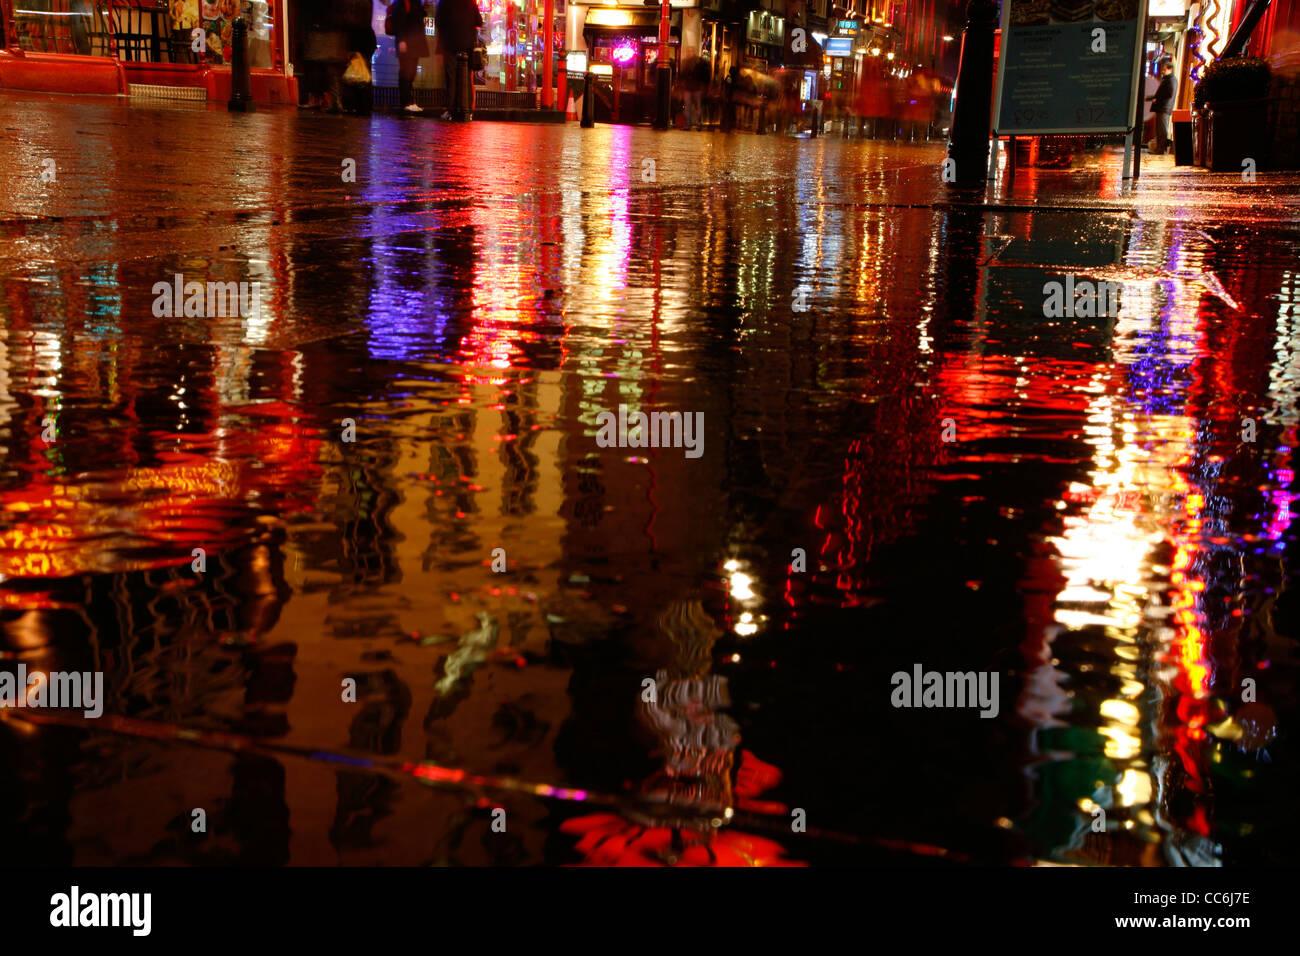 Rainy reflections on Wardour Street, Chinatown, London, UK - Stock Image